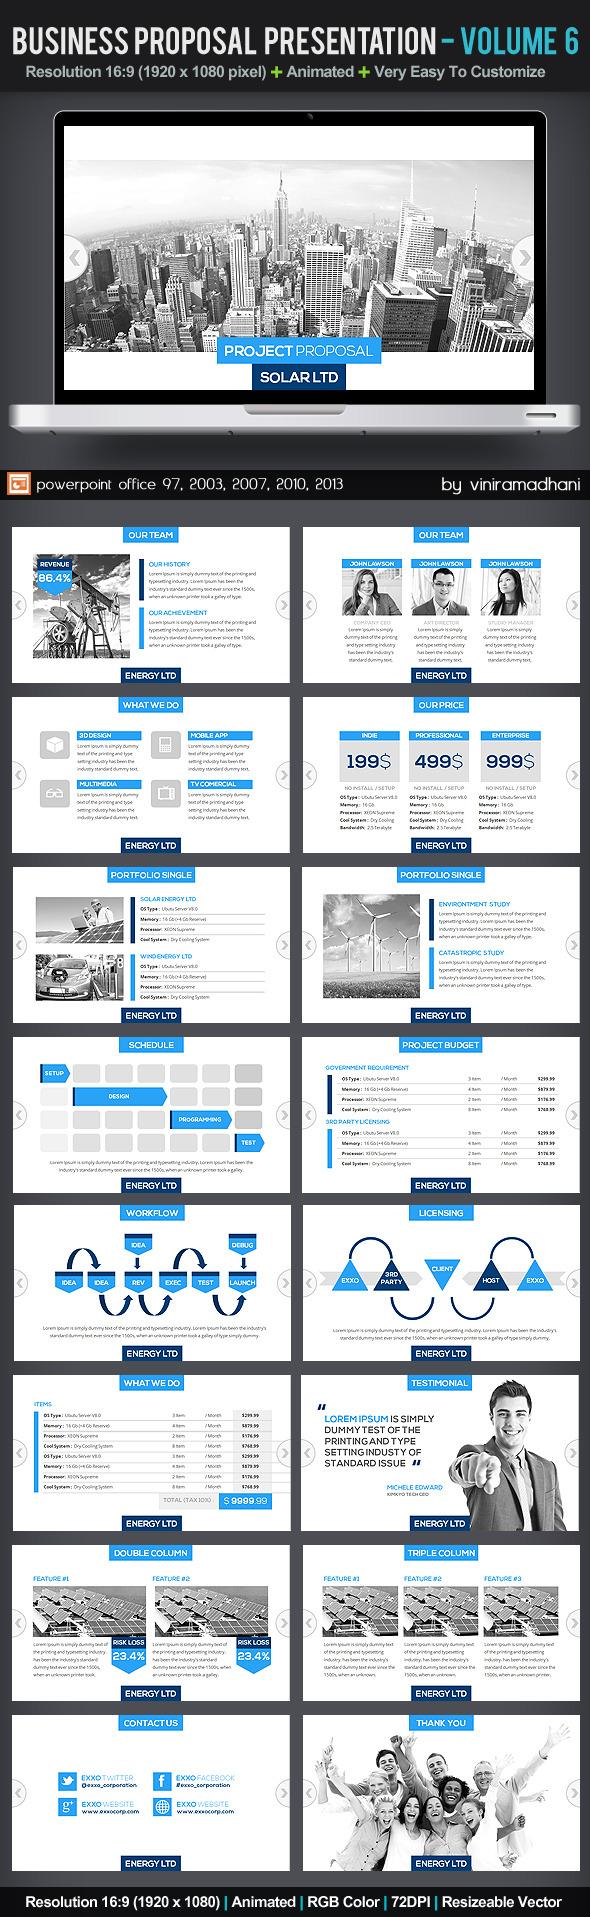 Business Proposal Presentation   Volume 6